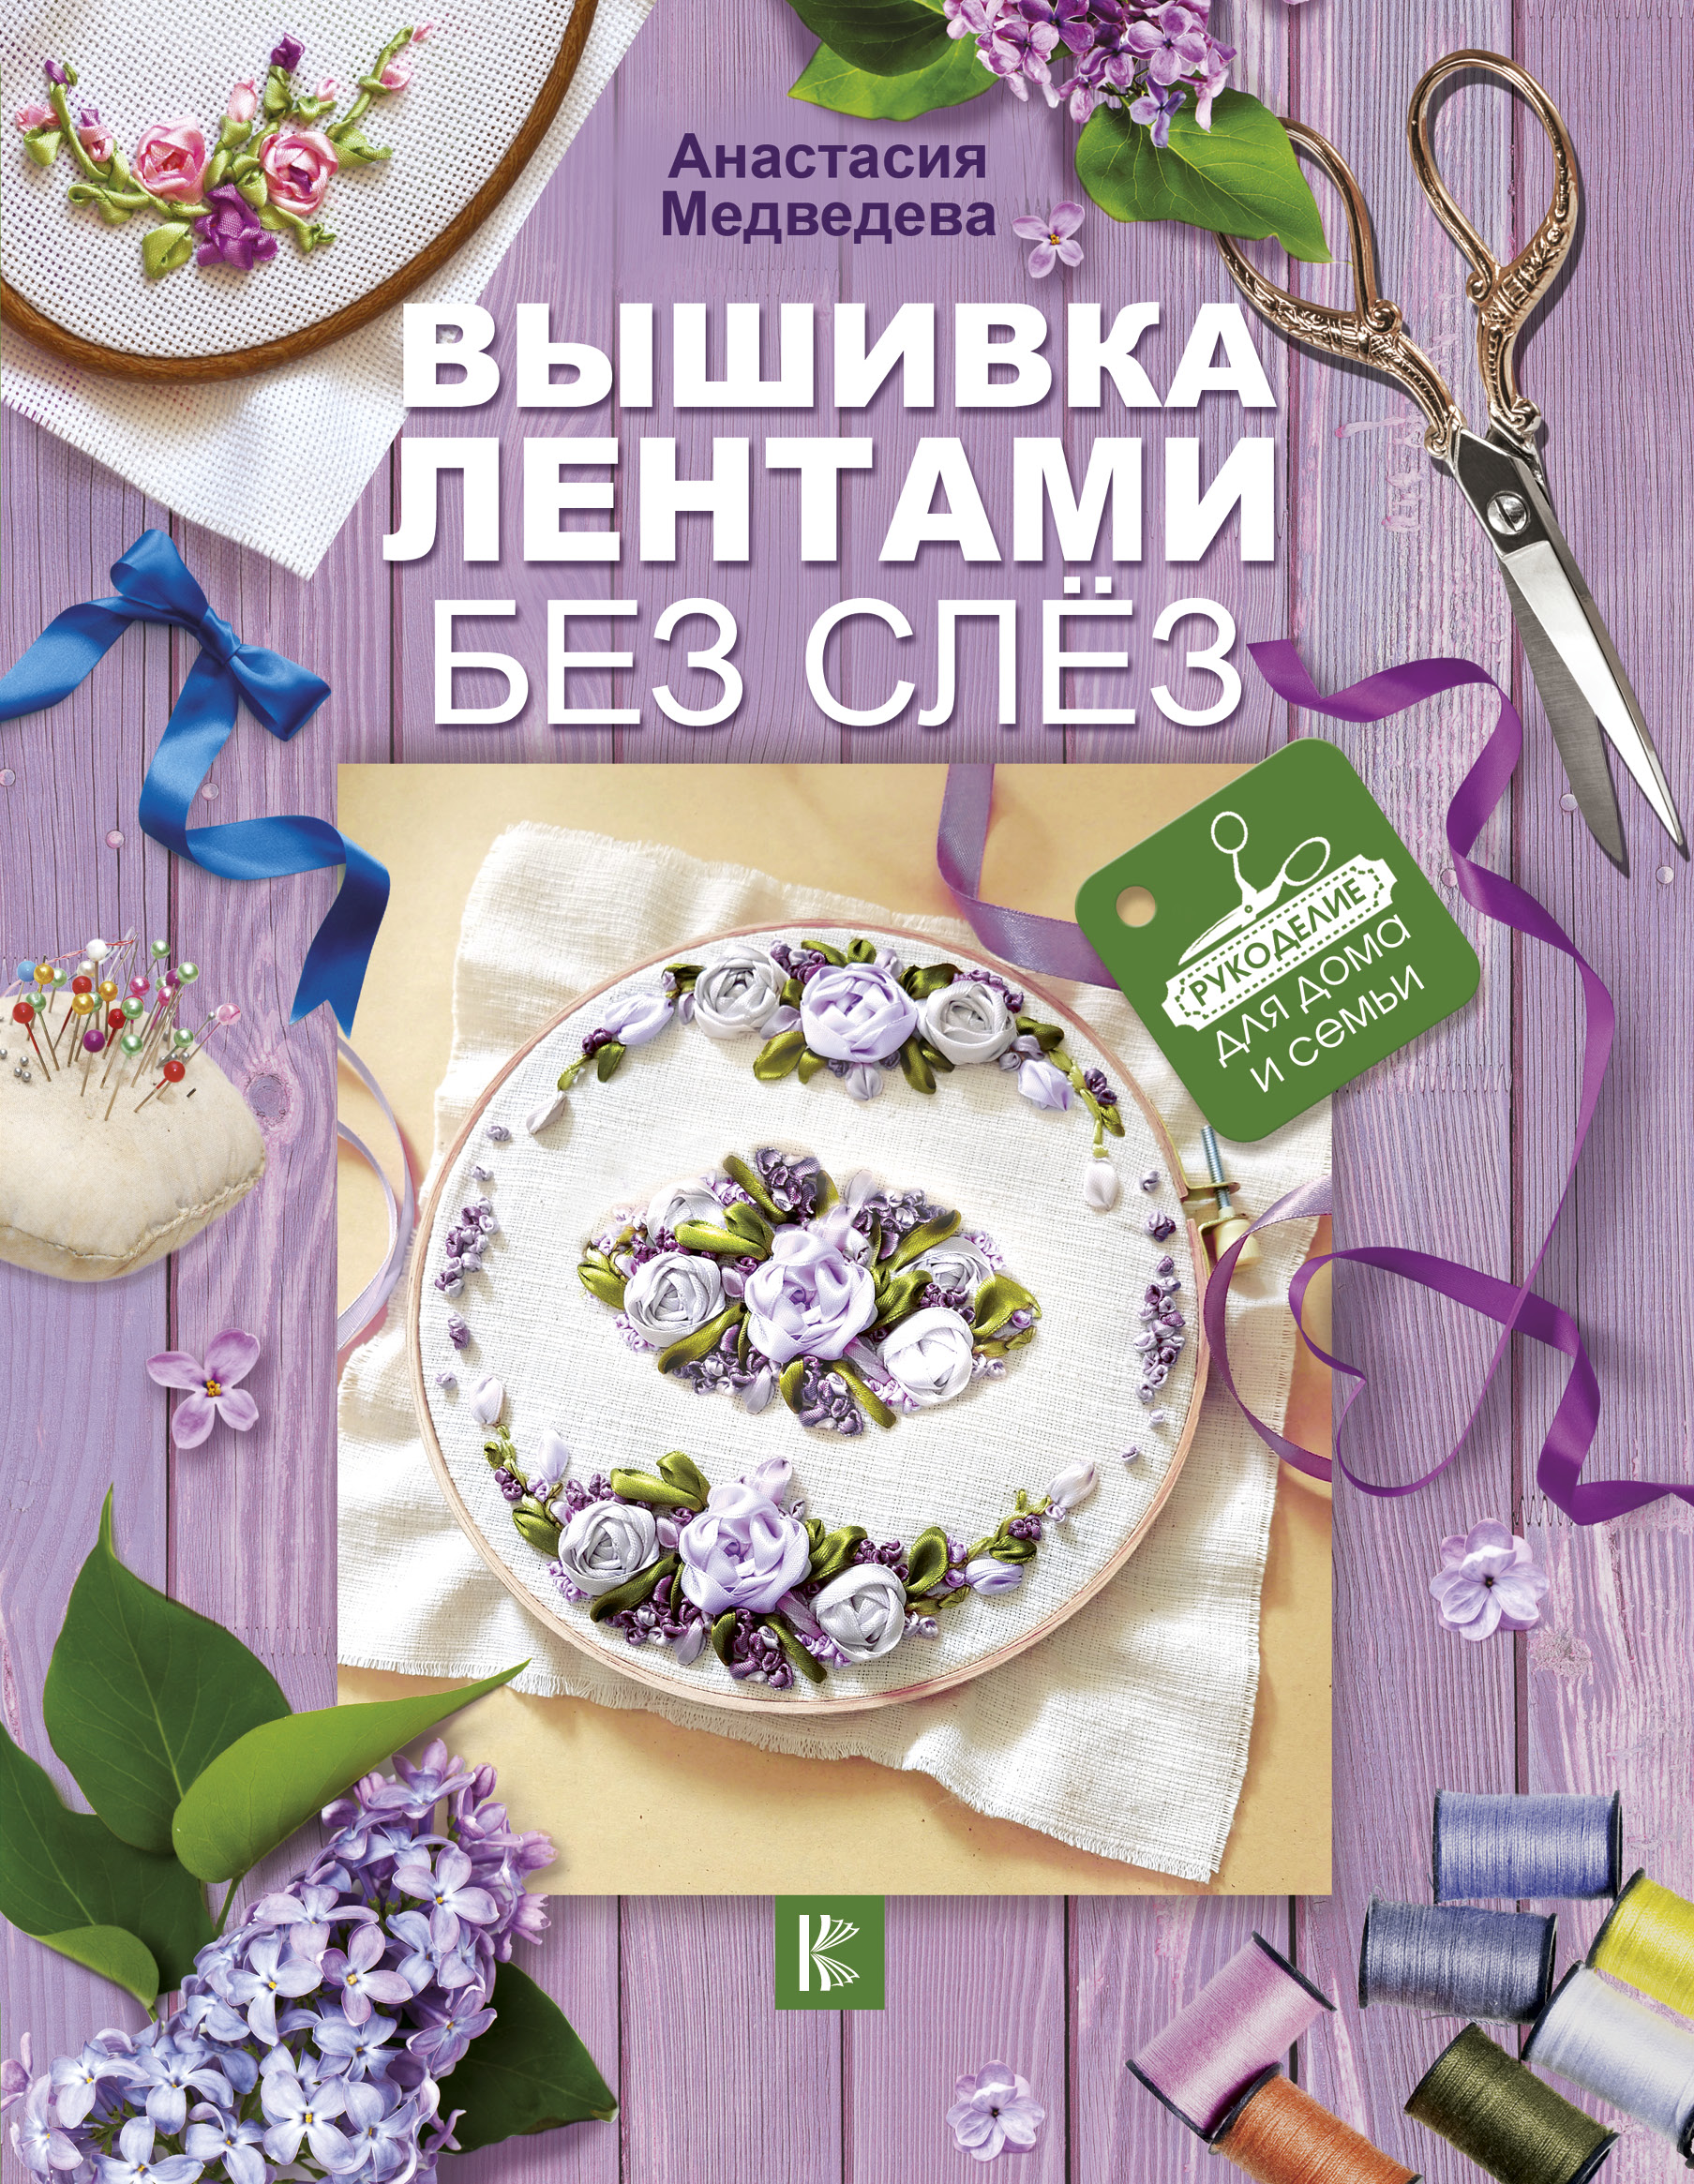 Медведева А. Вышивка лентами без слёз ISBN: 978-5-17-105277-5 вышивка лентами без слёз